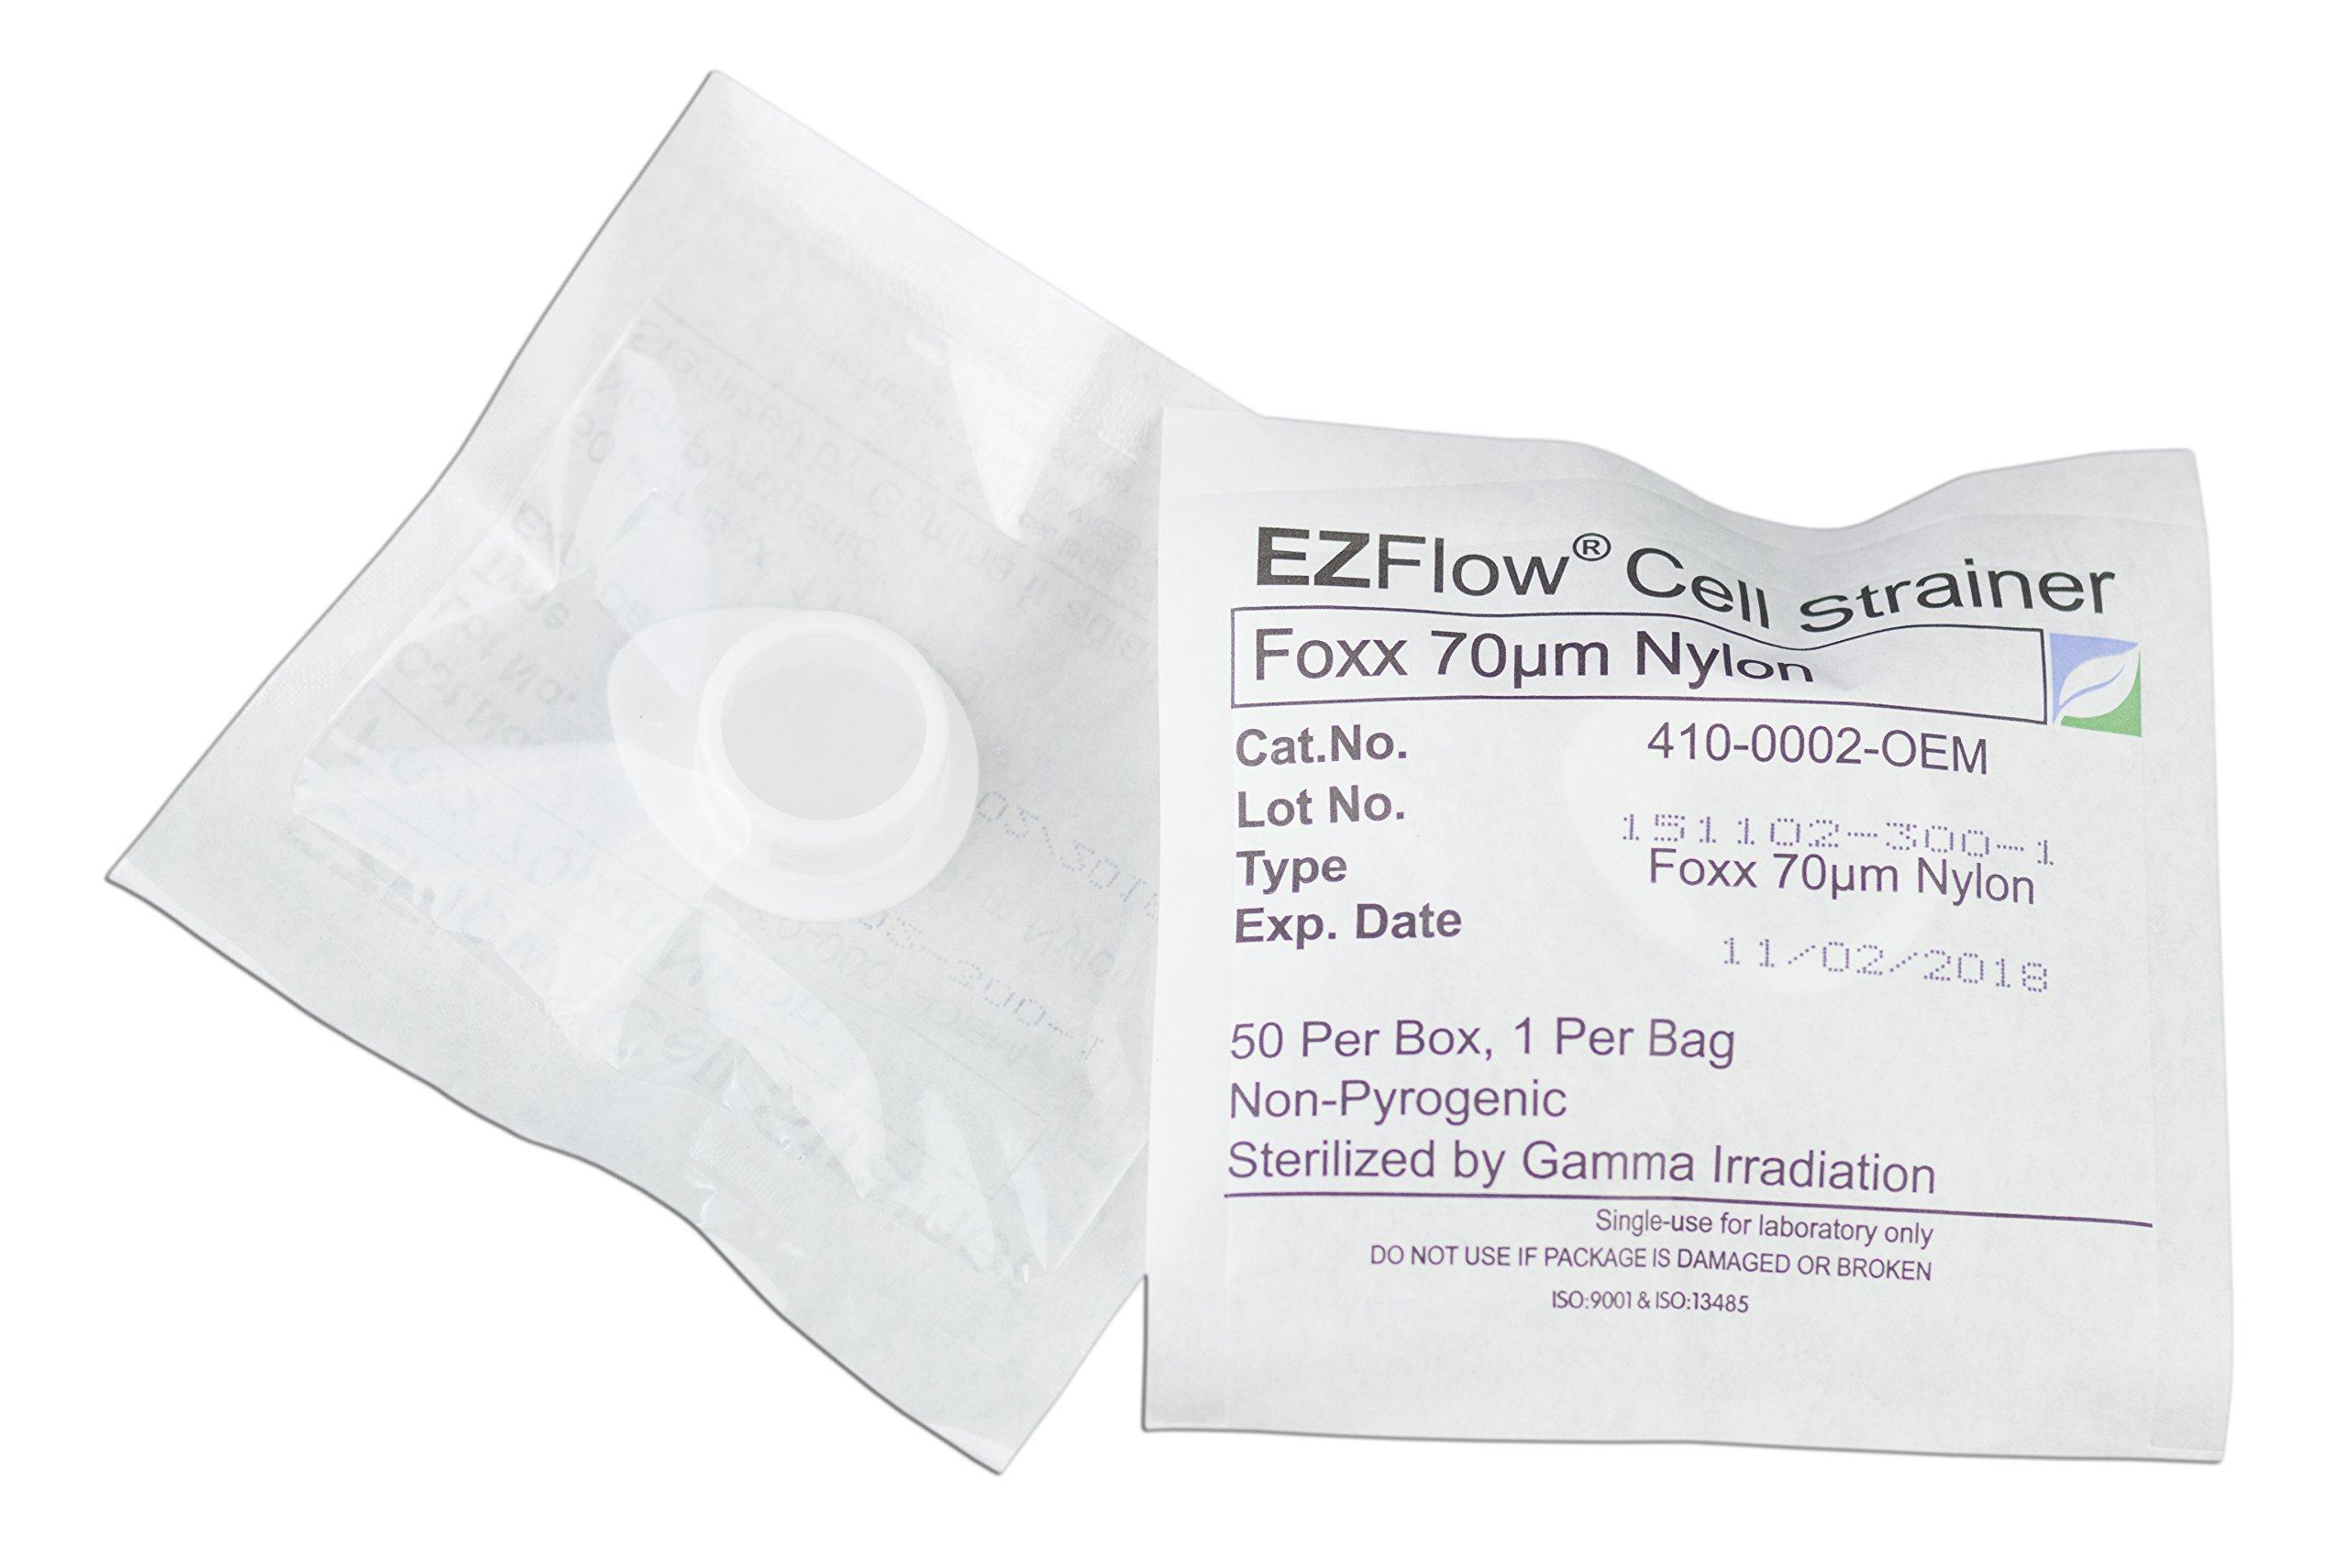 EZFlow Cell Strainer, 70μm, Sterile, White, 50 per Box by Foxx Life Sciences